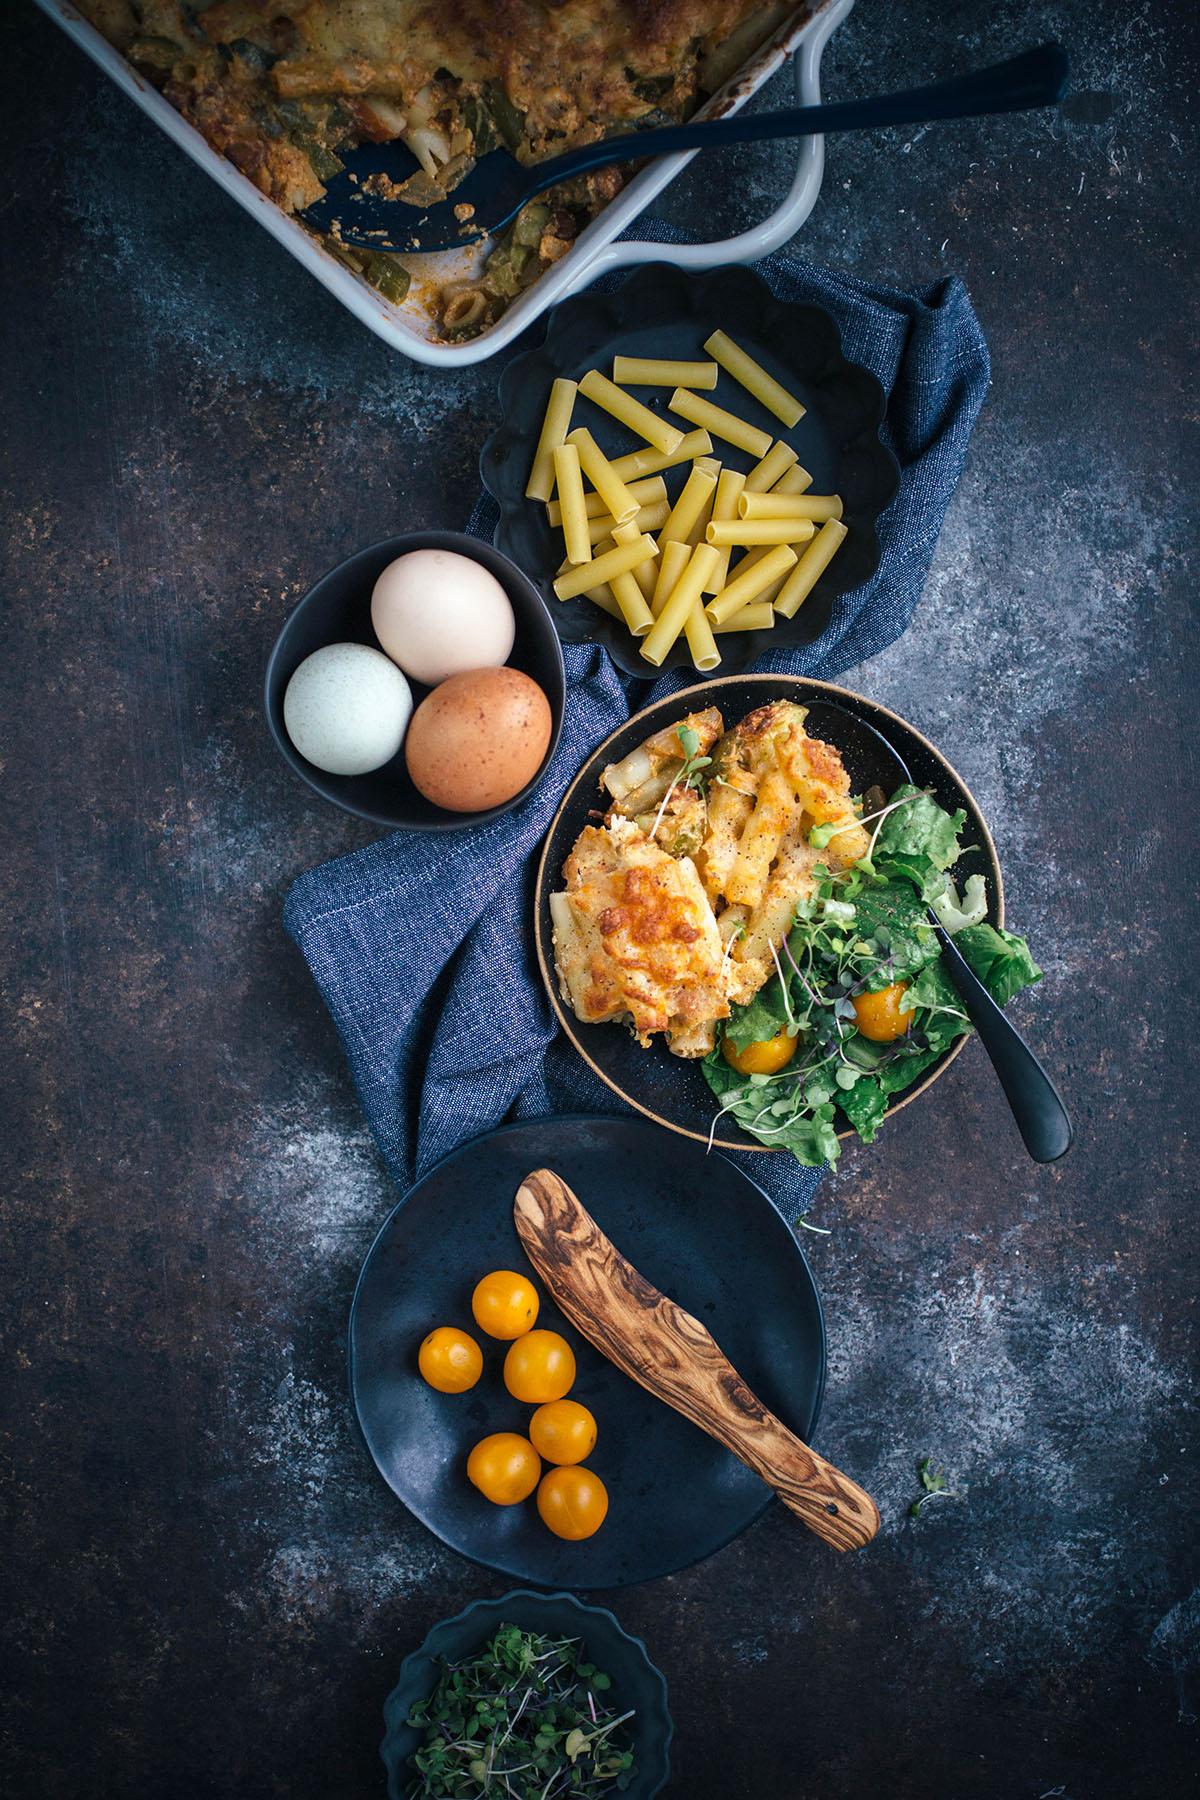 Vegetarian Baked Ziti